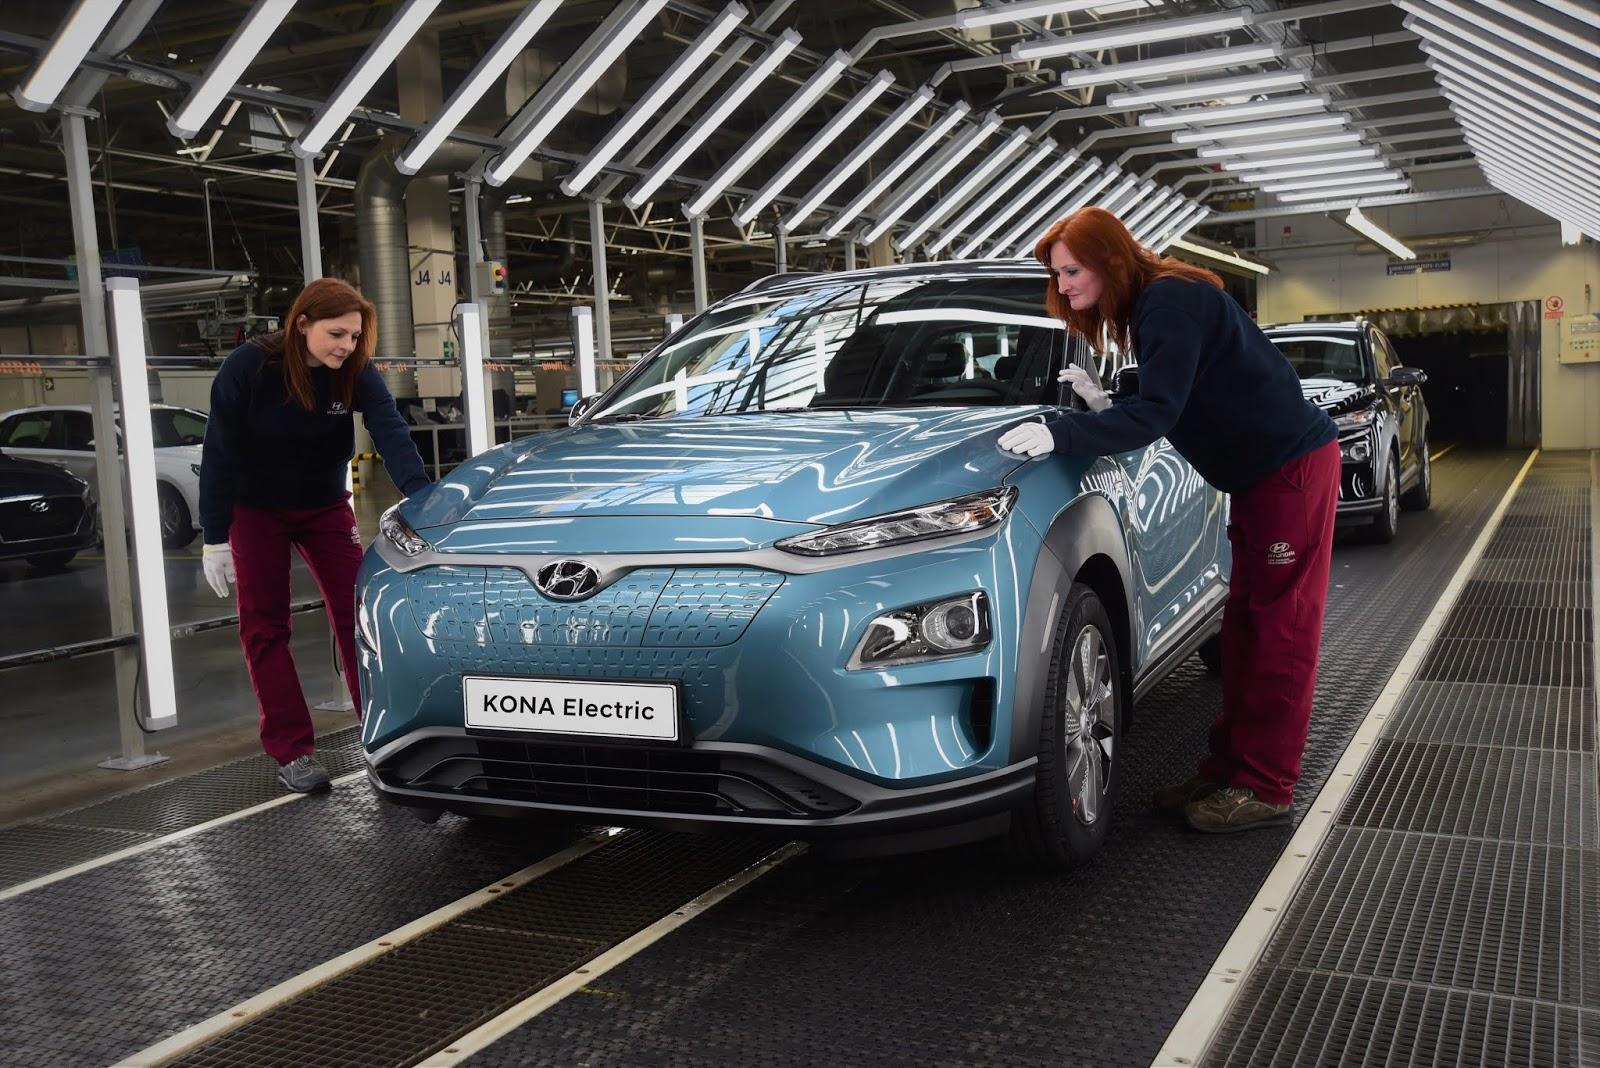 KONA2BEV2BHMMC2B2 80.000 οχήματα μηδενικών ρύπων θα ρίξει στην Ευρώπη η Hyundai